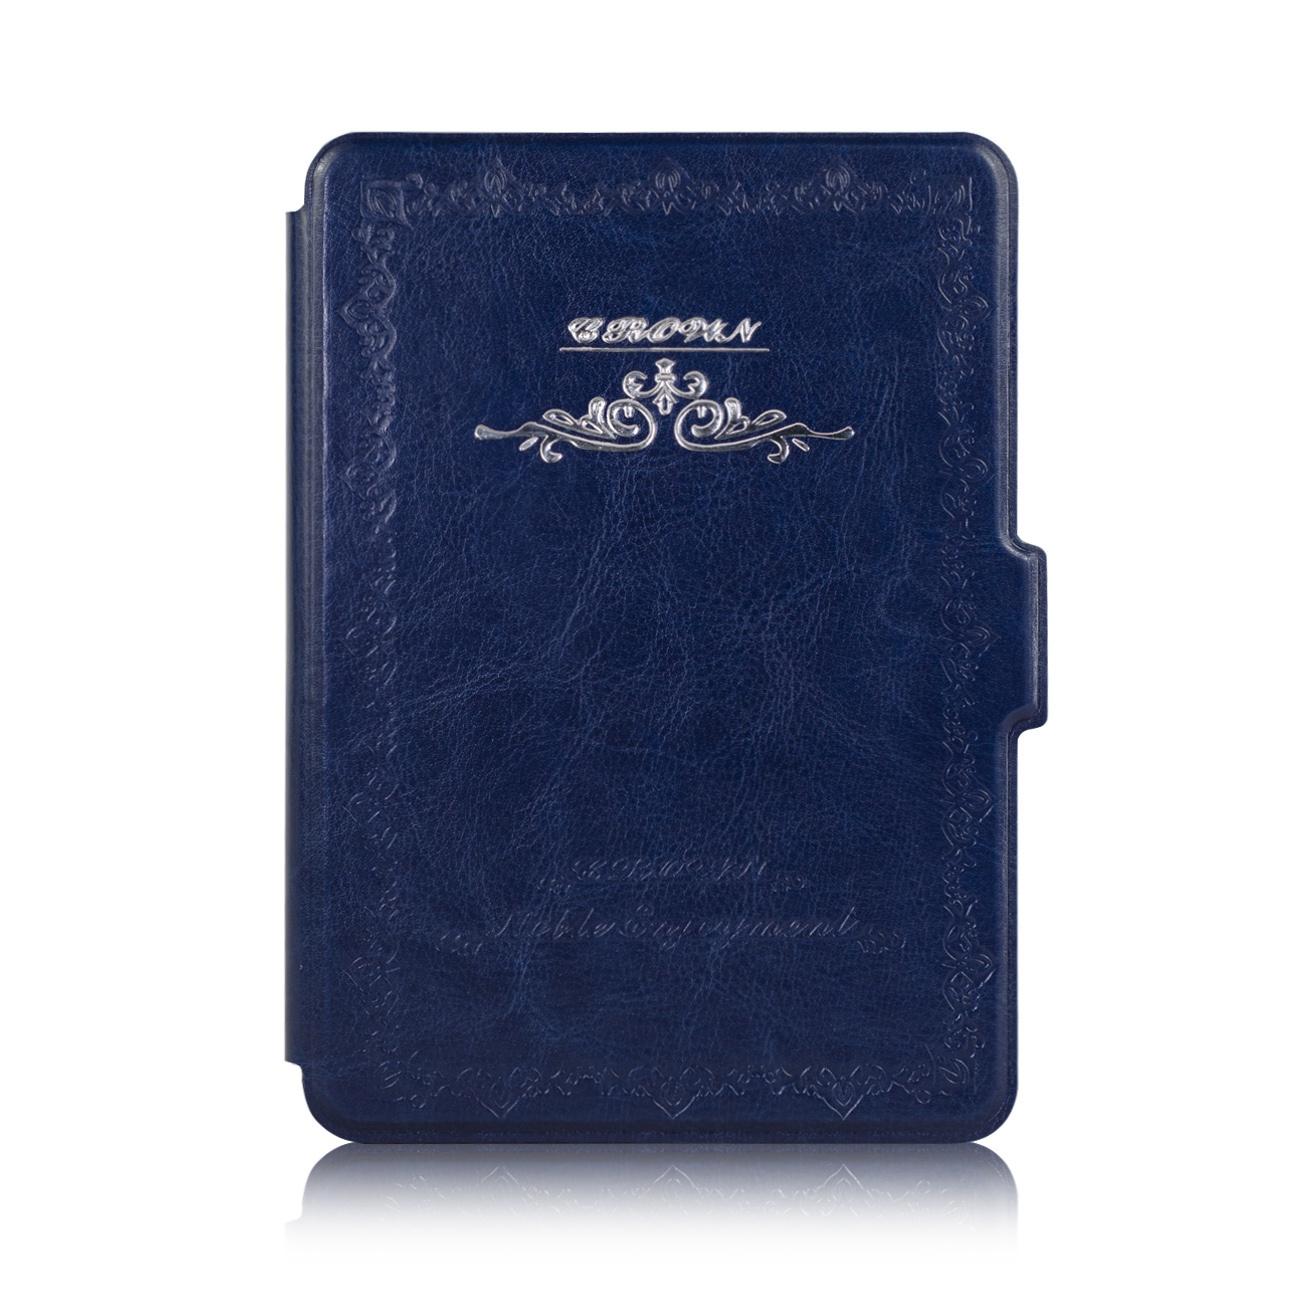 Чехол-обложка GoodChoice Vintage для Amazon Kindle 8 (темно-синий) кейс для назначение amazon kindle fire hd 8 7th generation 2017 release бумажник для карт кошелек со стендом с узором авто режим сна